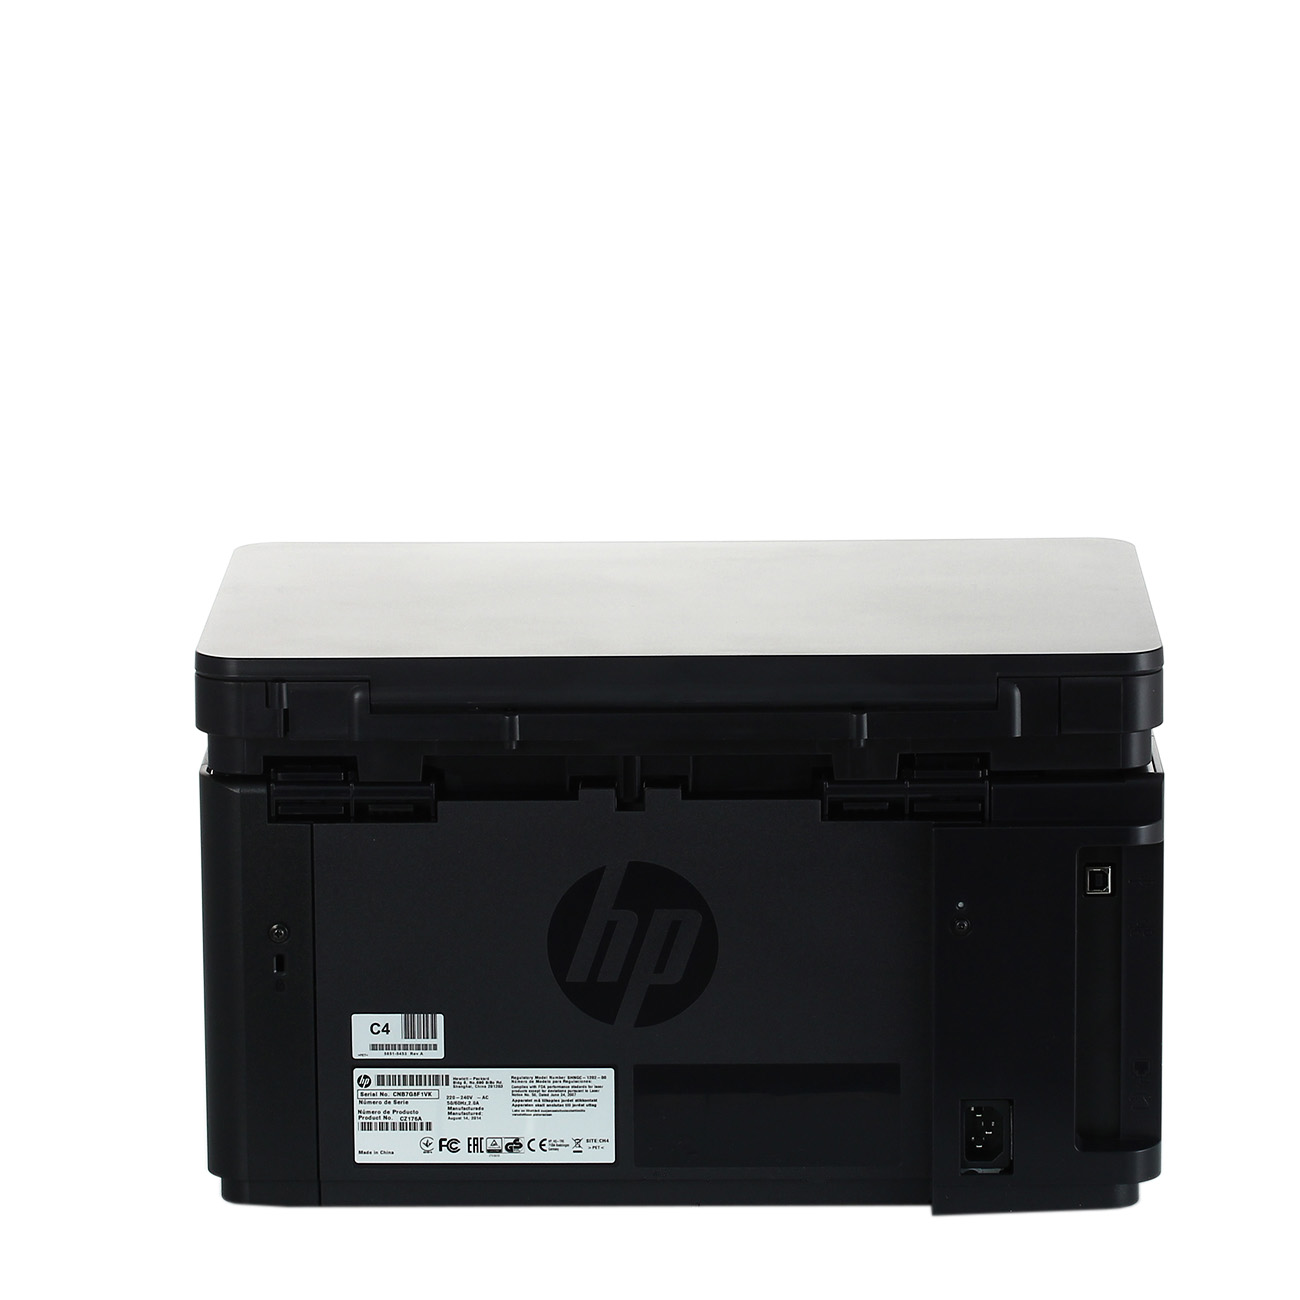 hp laserjet pro mfp m125r инструкция